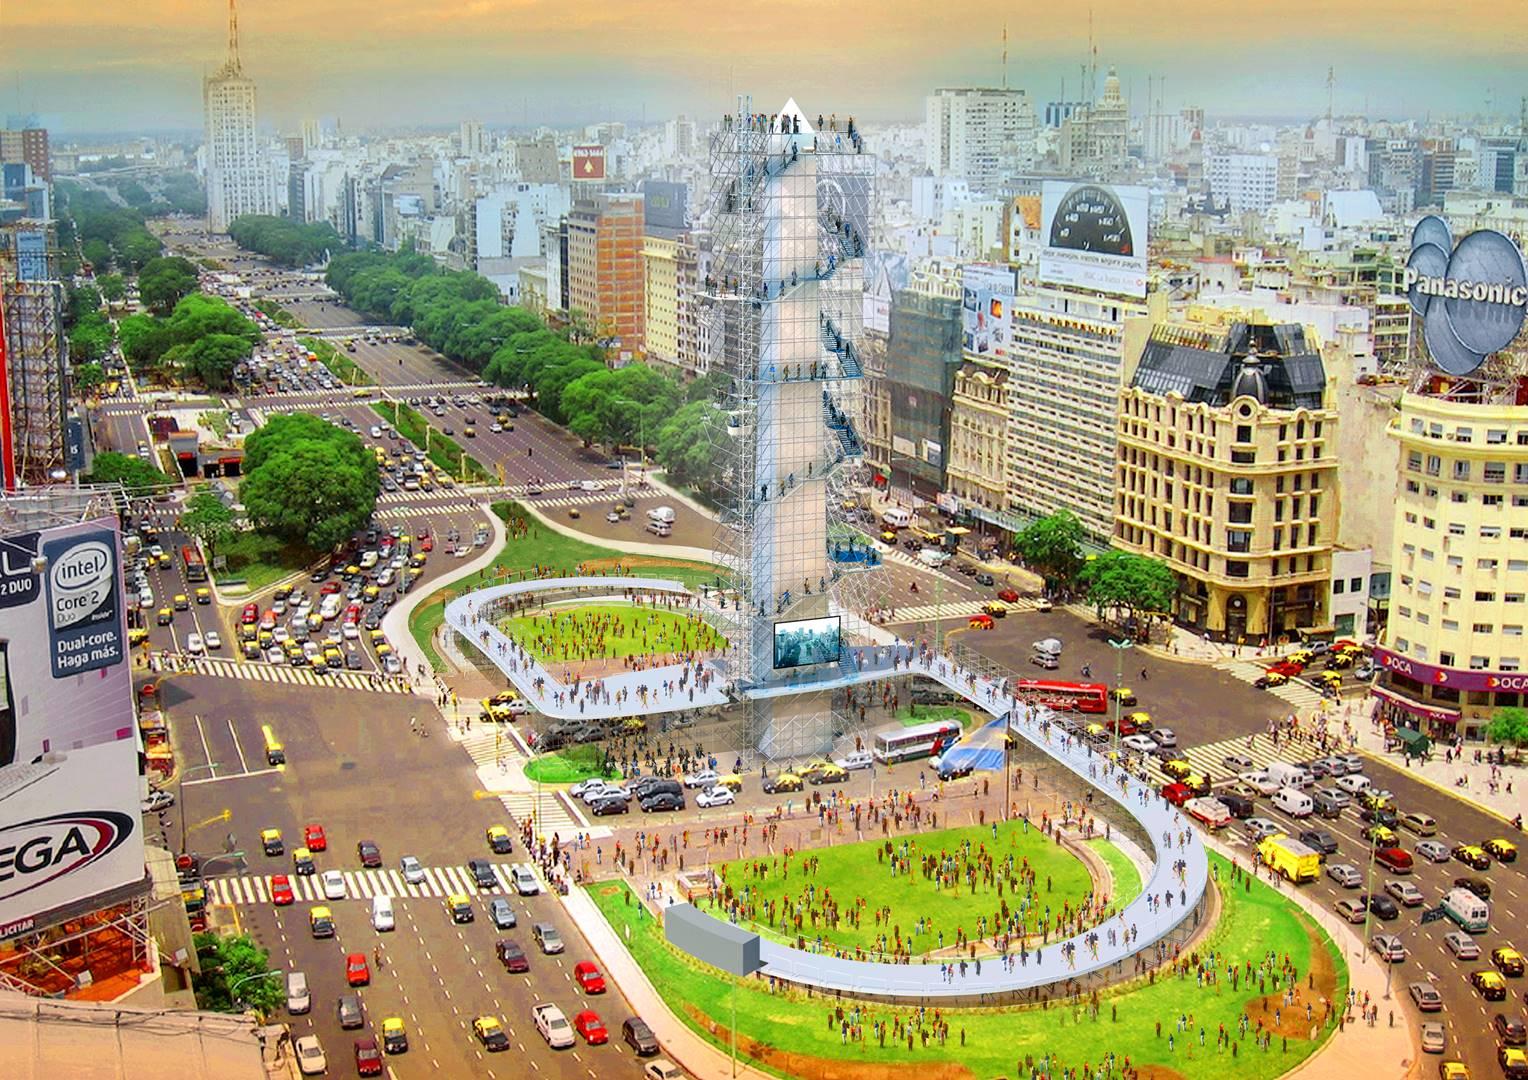 Obelisco - Version Espiral (Copy)